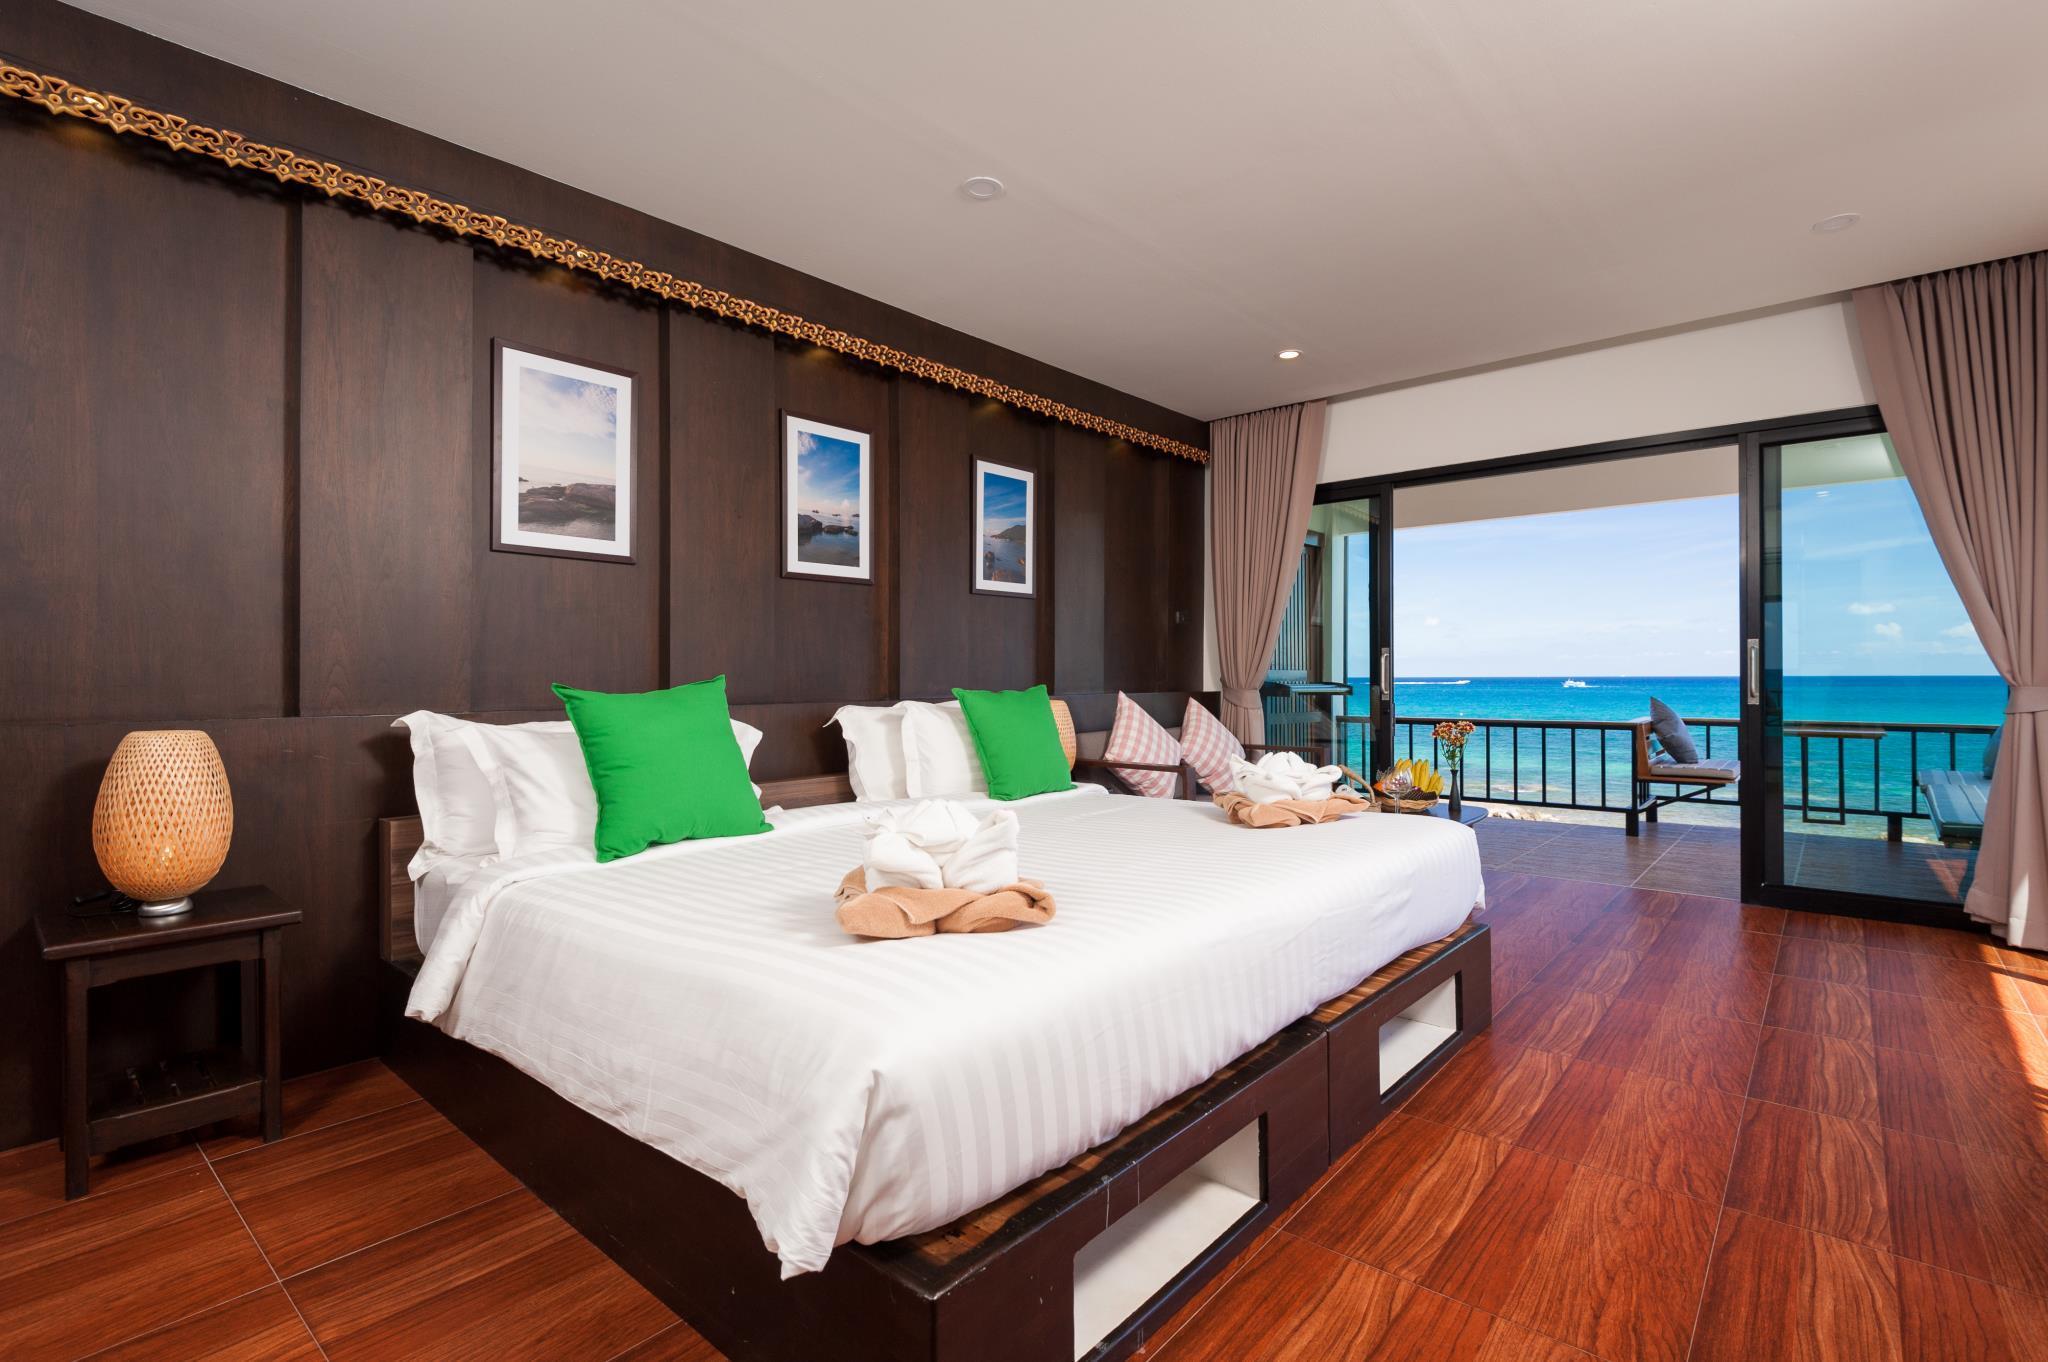 Simple Life Cliff View Resort in Koh Tao - Room Deals